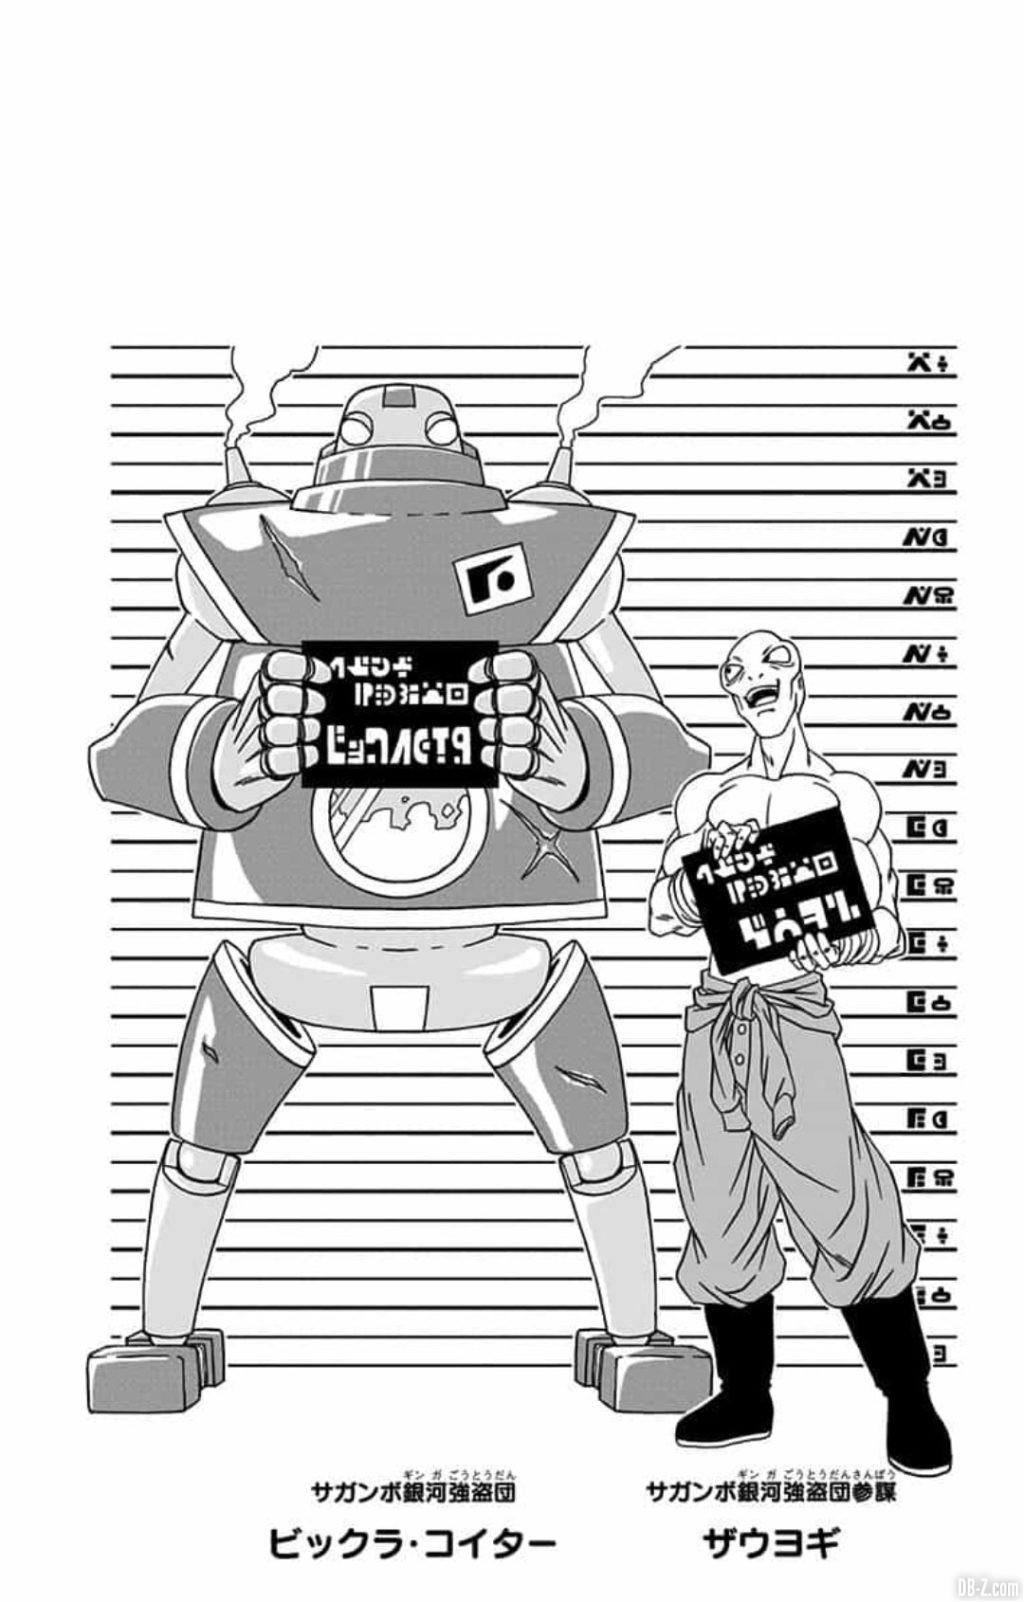 DBS Tome 13 Page Bonus 2